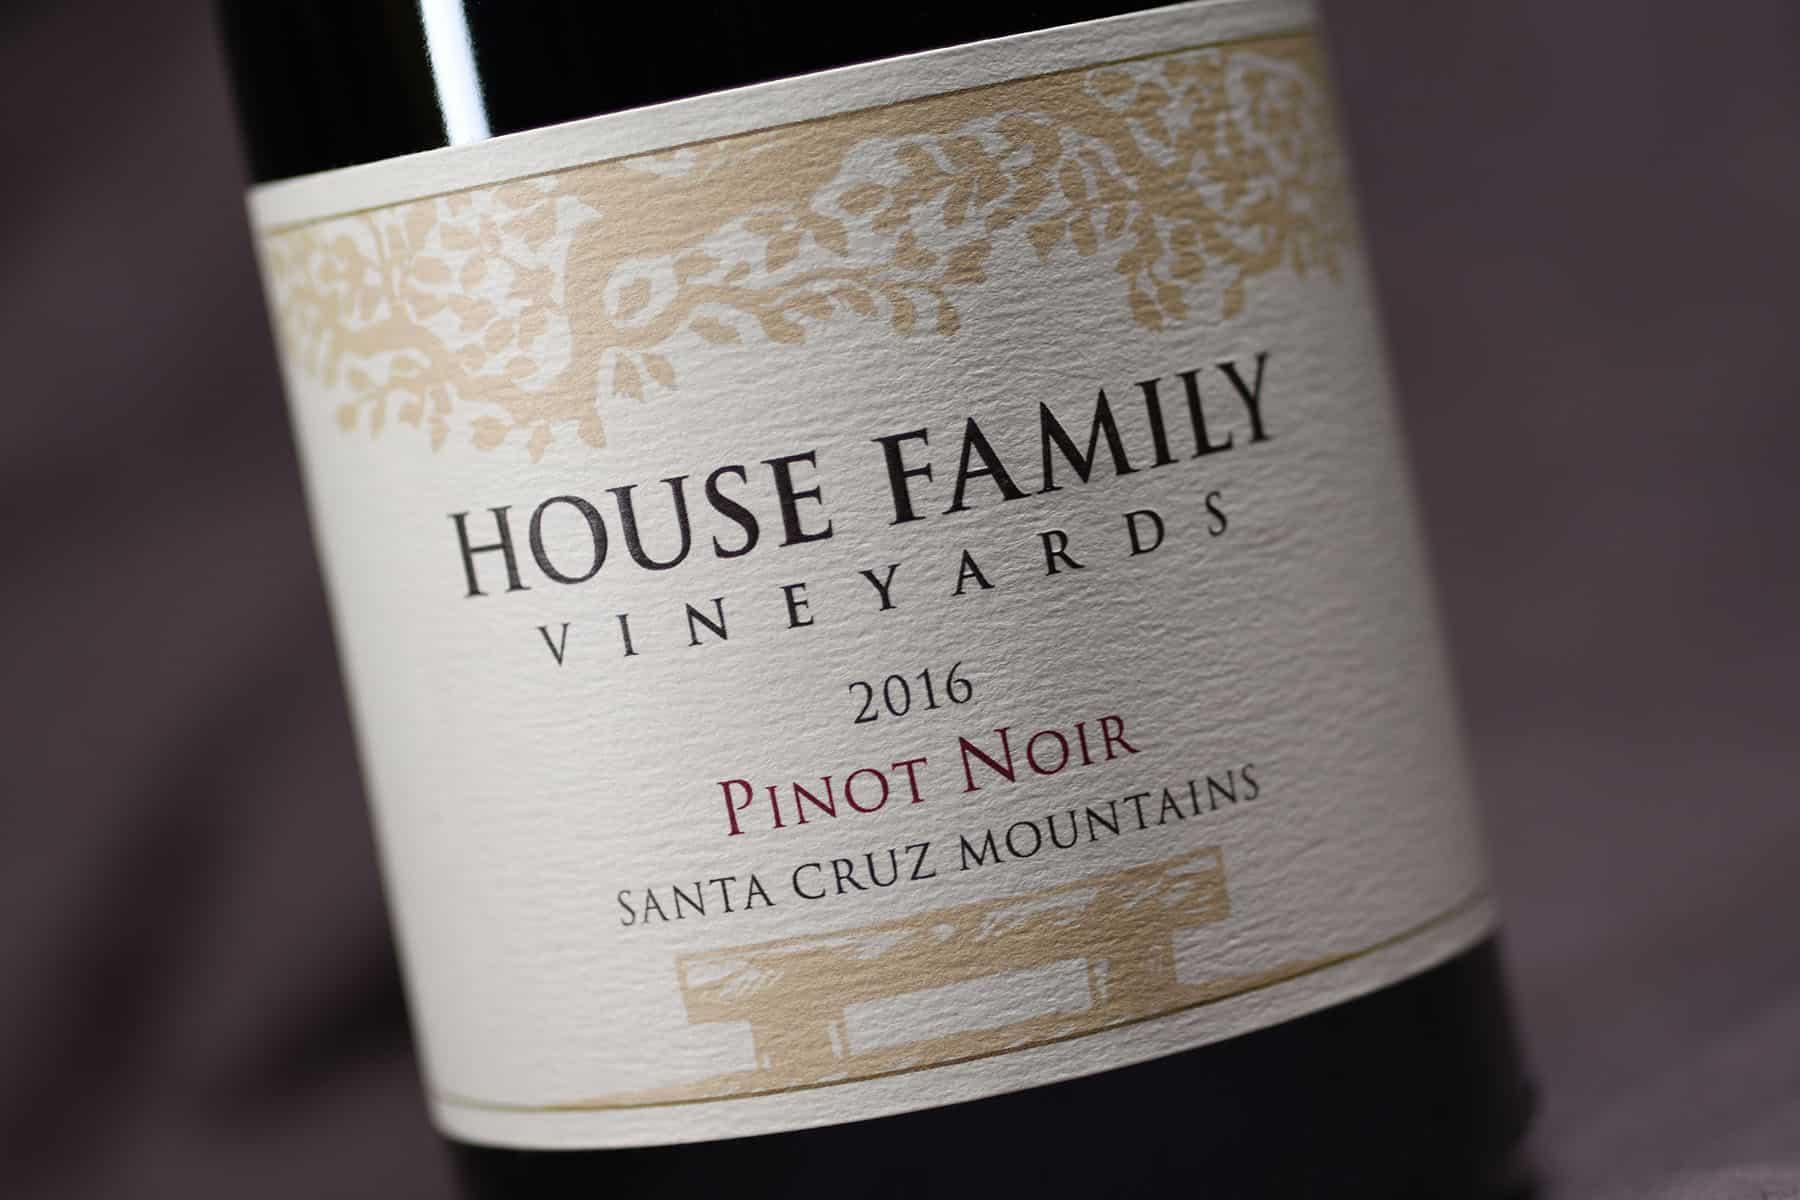 House Family Vineyards Pinot Noir label